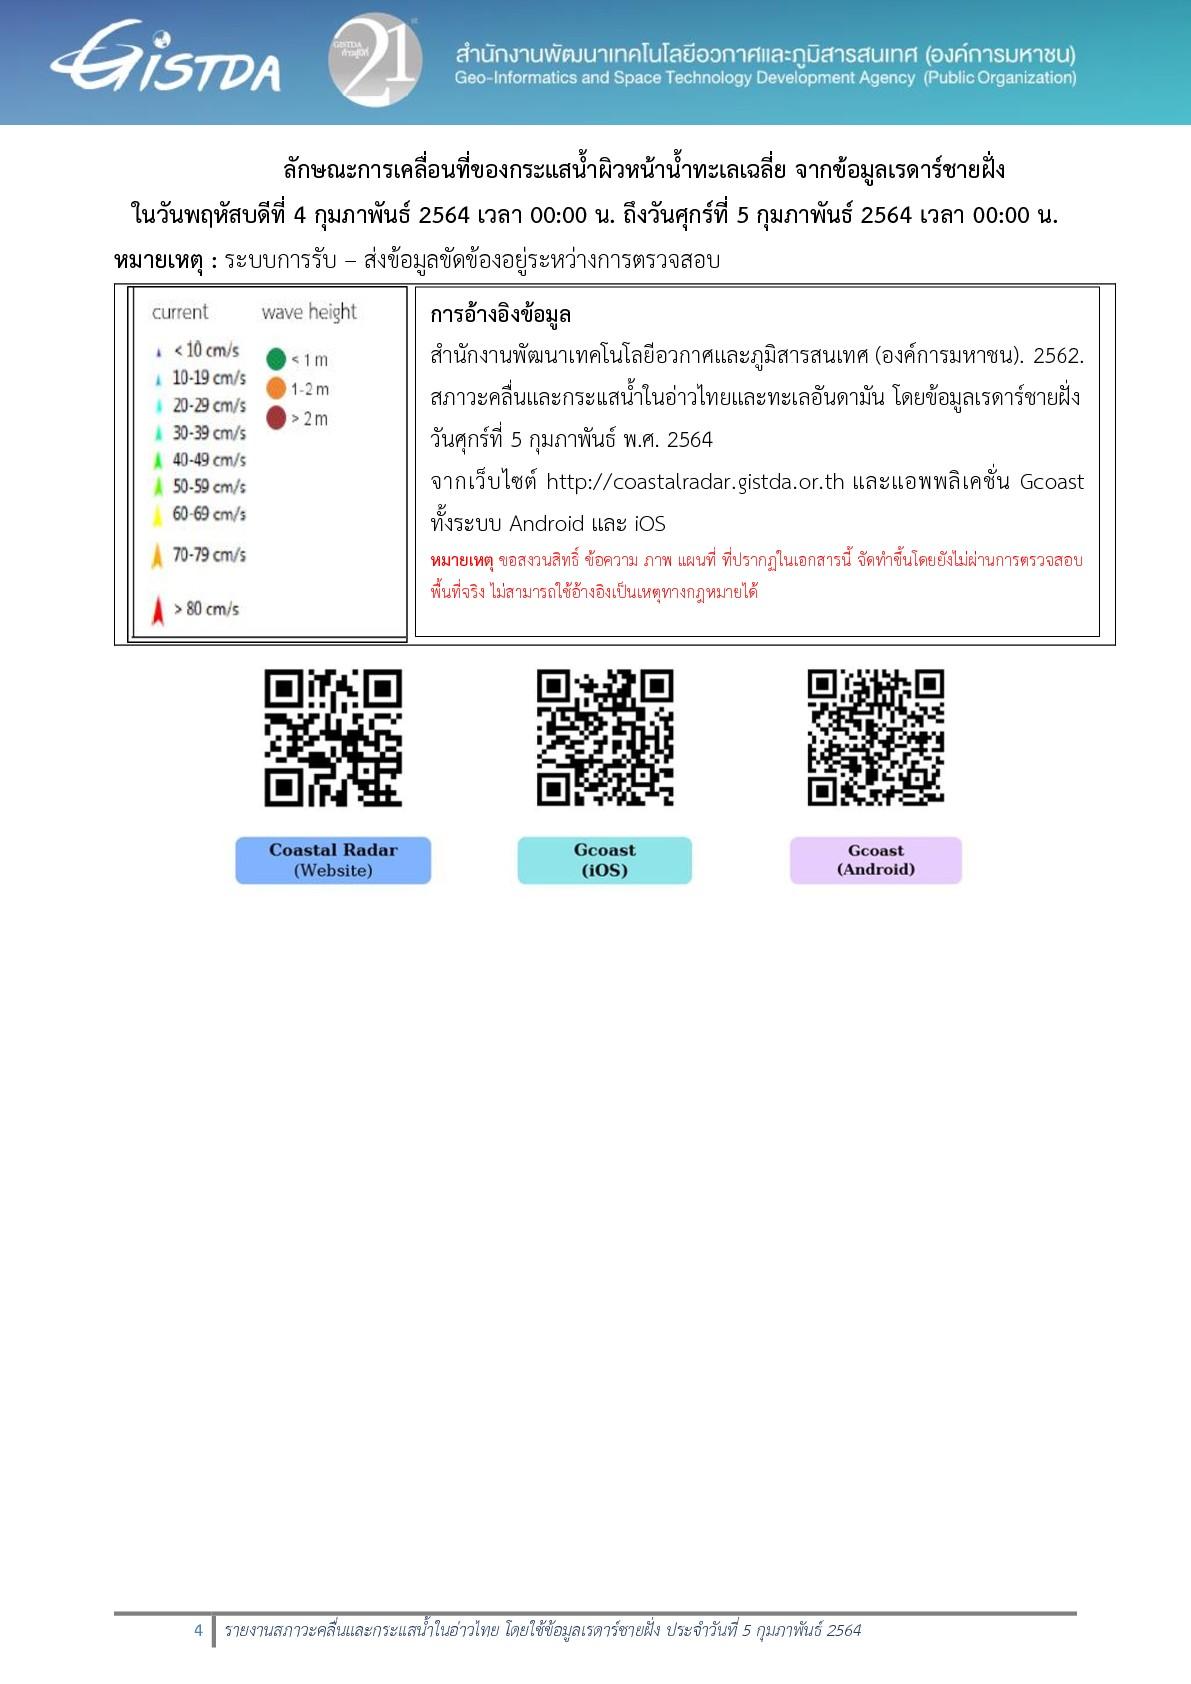 20210205-004-004